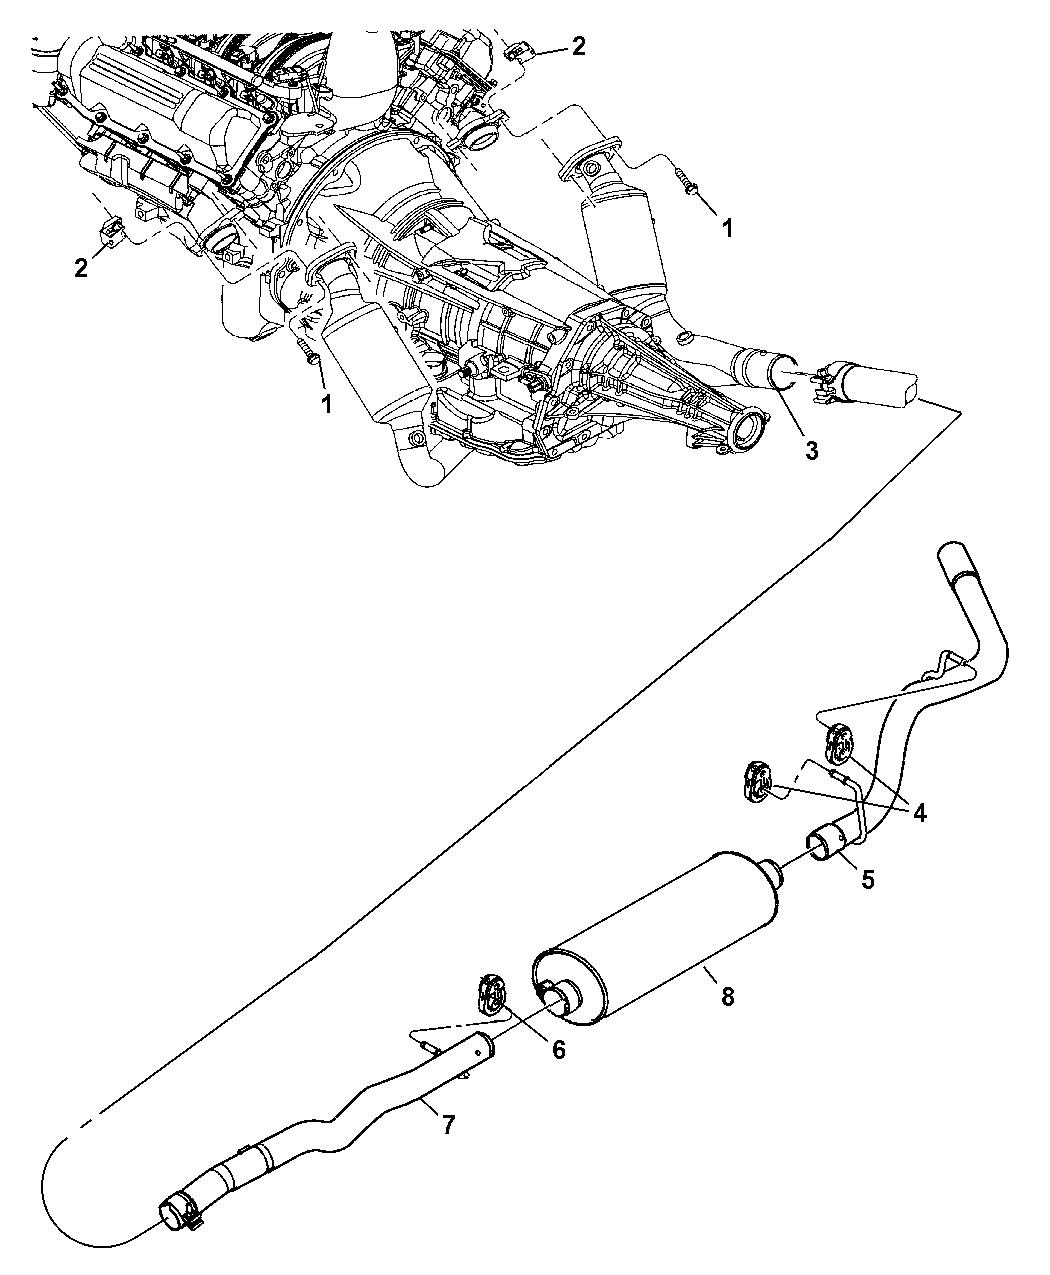 2005 Dodge Dakota Exhaust System